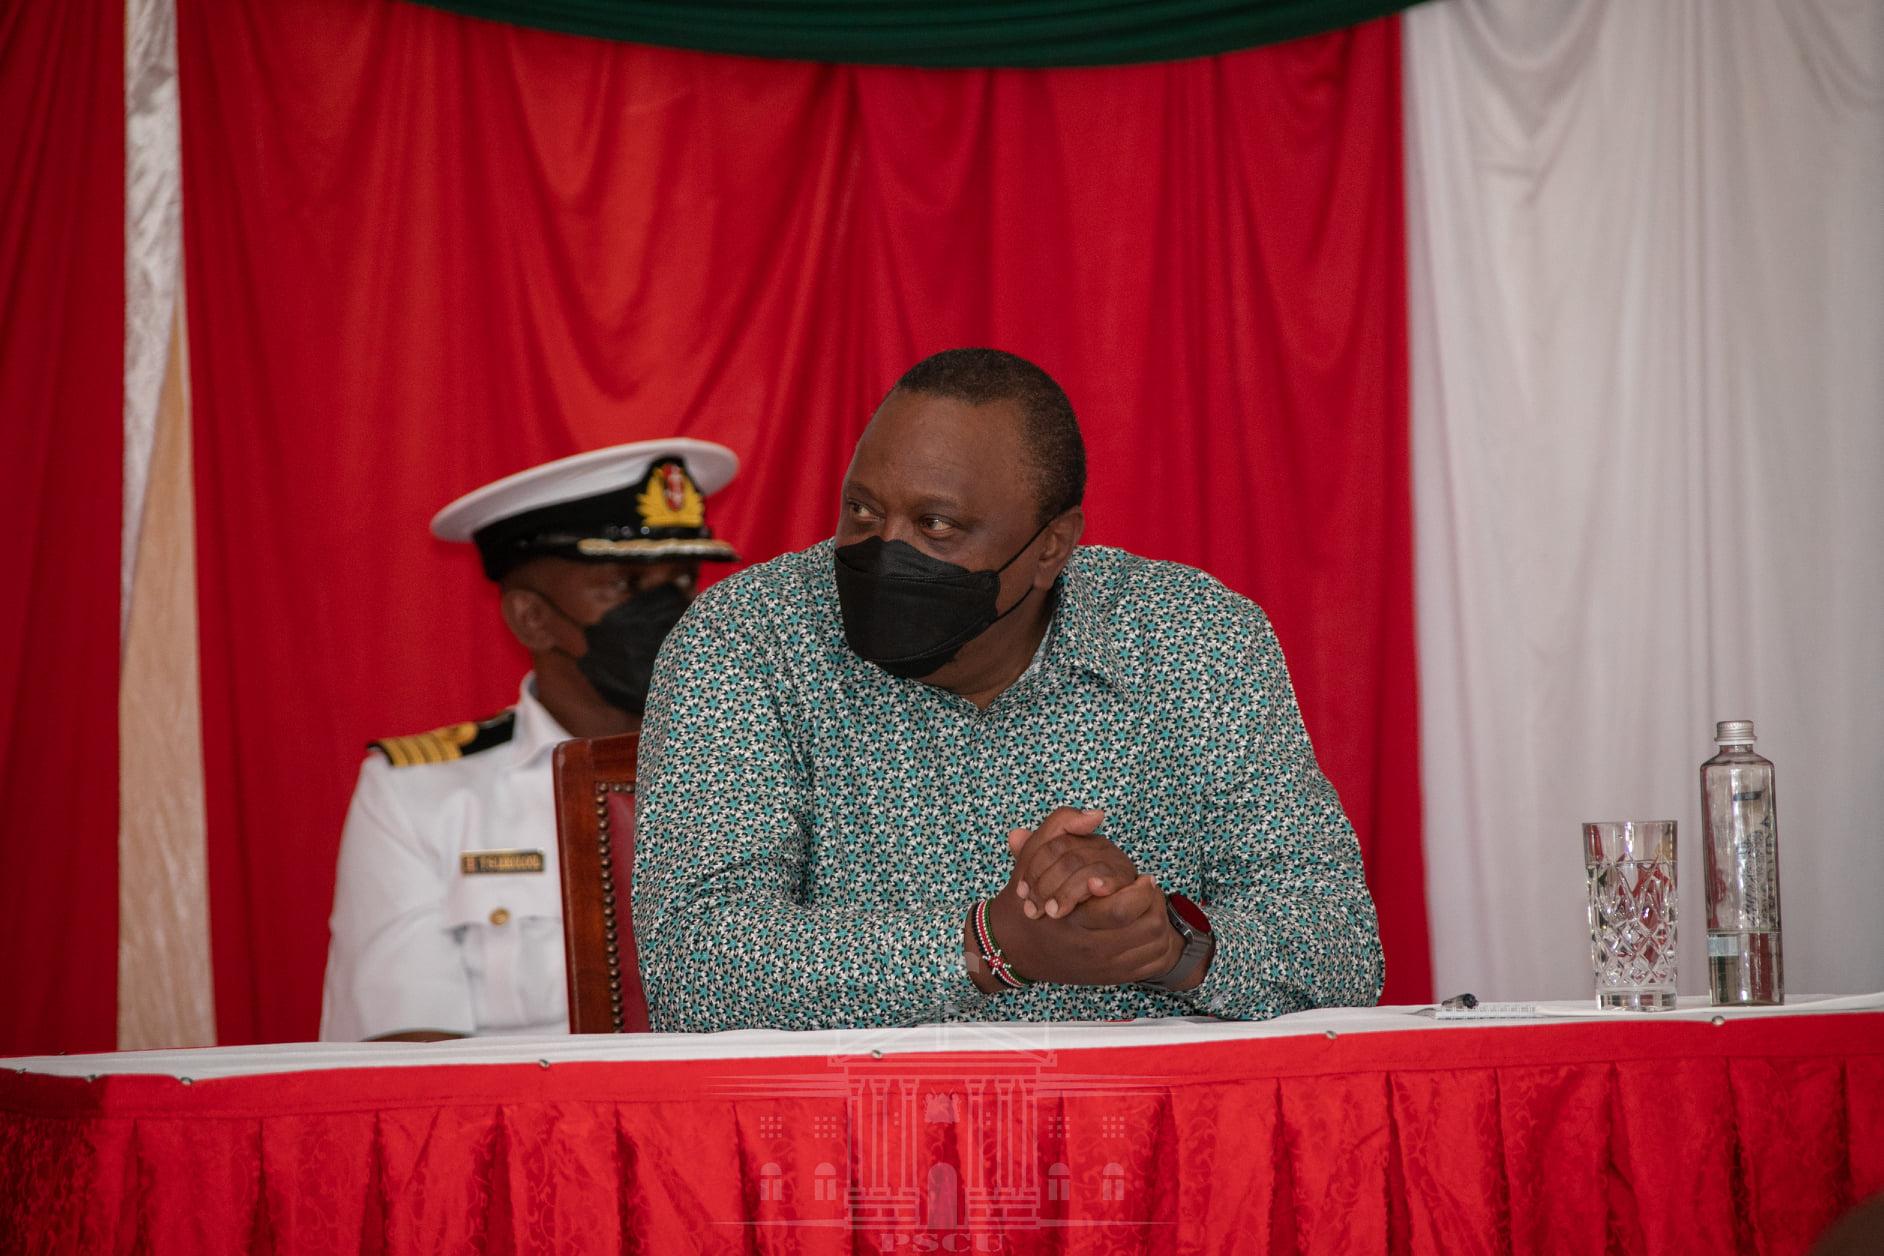 President Kenyatta hints at lifting COVID-19 curfew soon